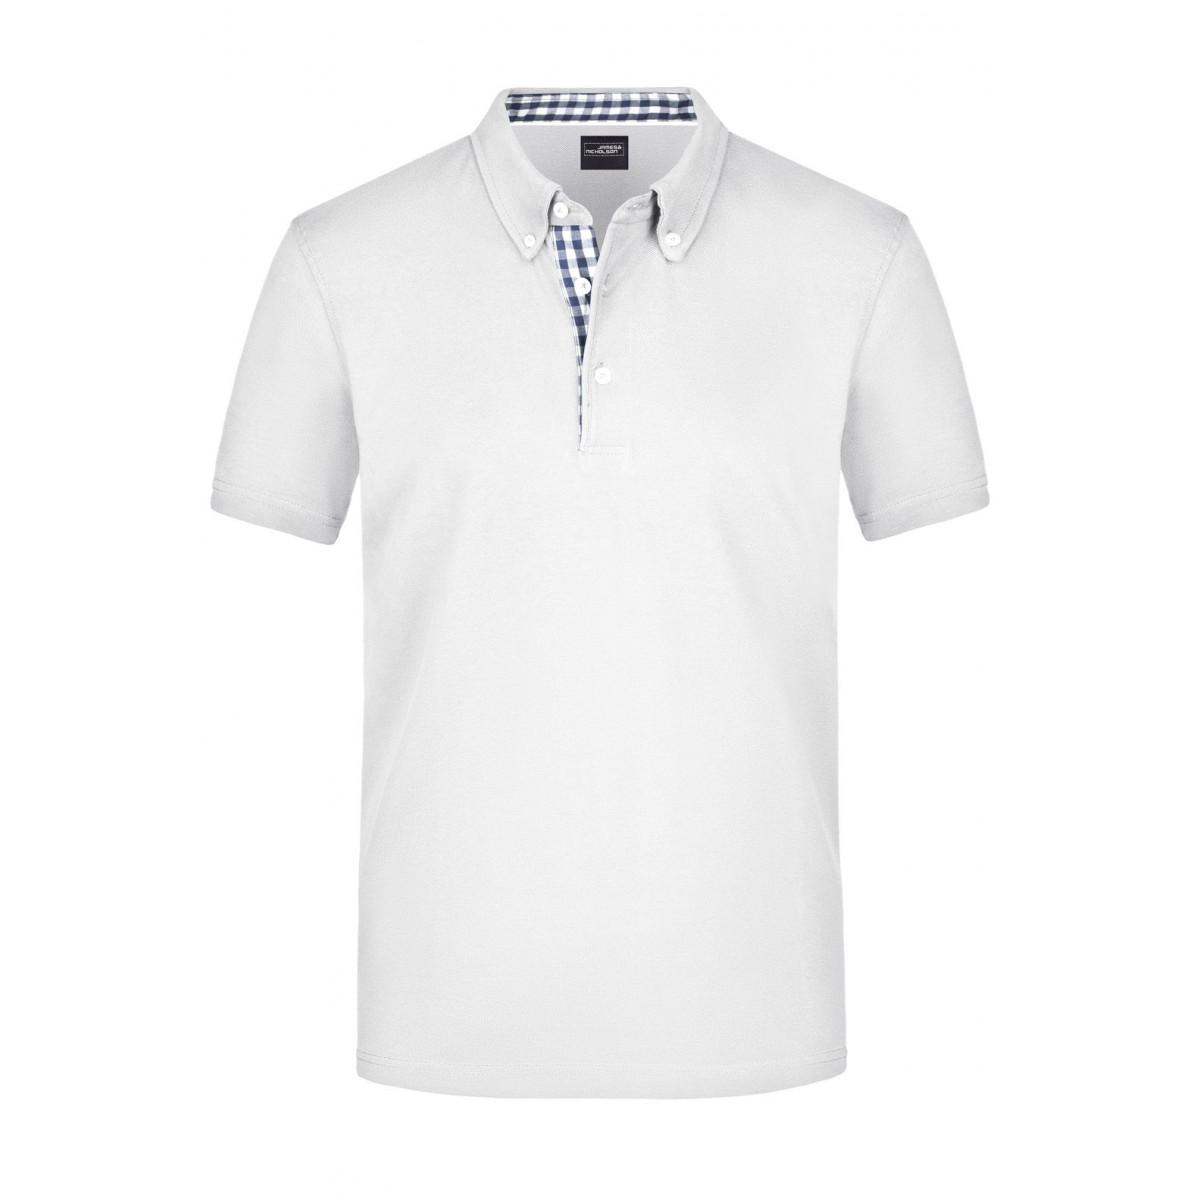 Рубашка поло мужская JN964 Mens Plain Polo - Белый/Темно-синий-Белый